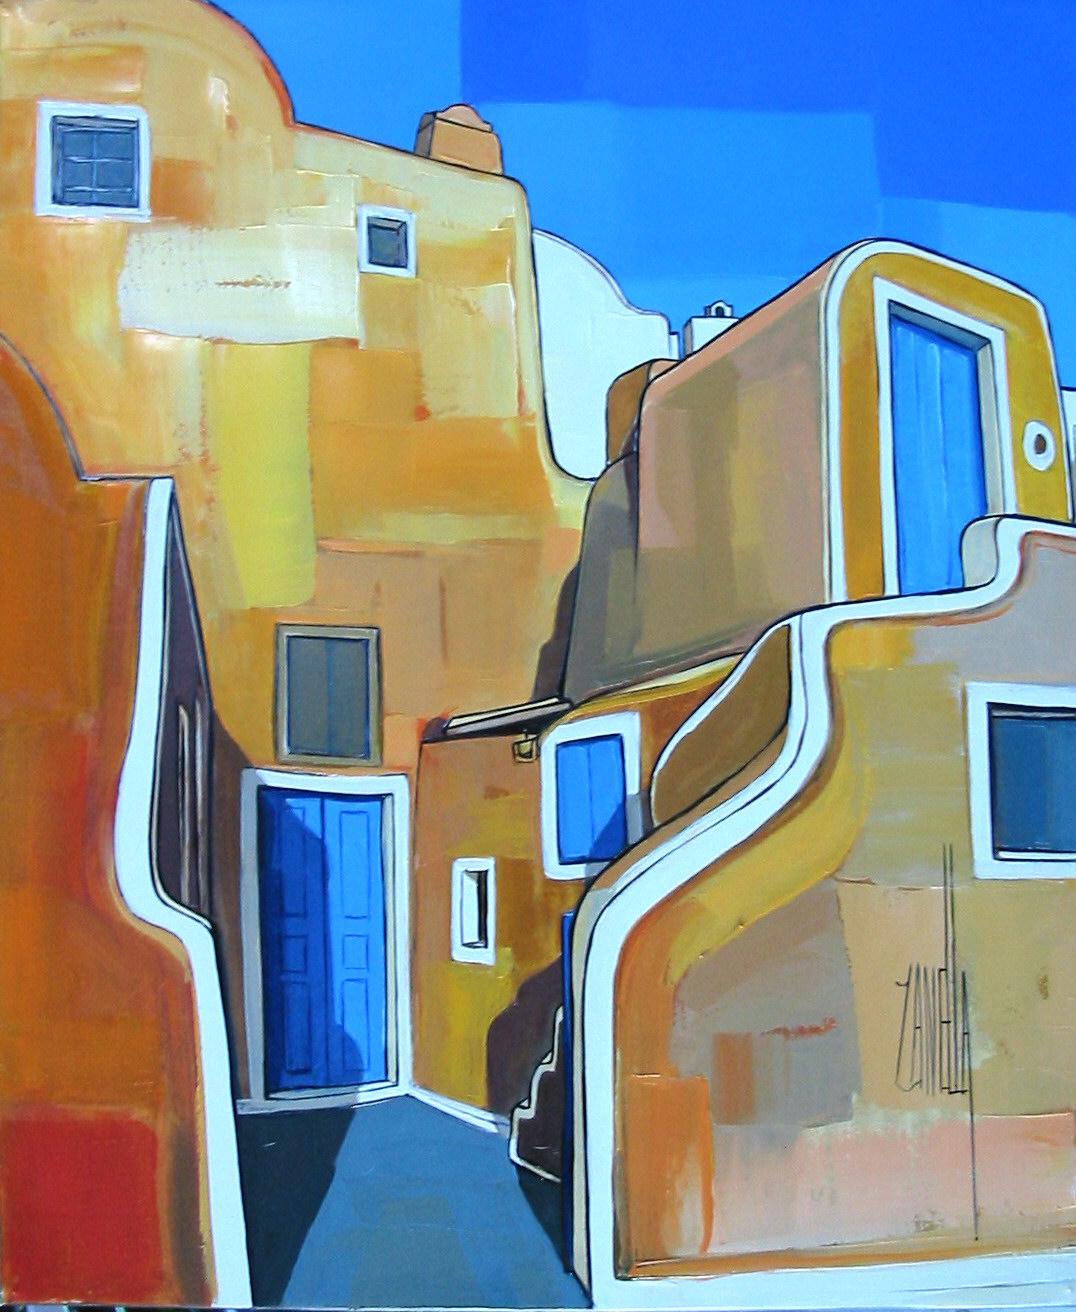 2005-OIA - la maison jaune- Santorin-8F